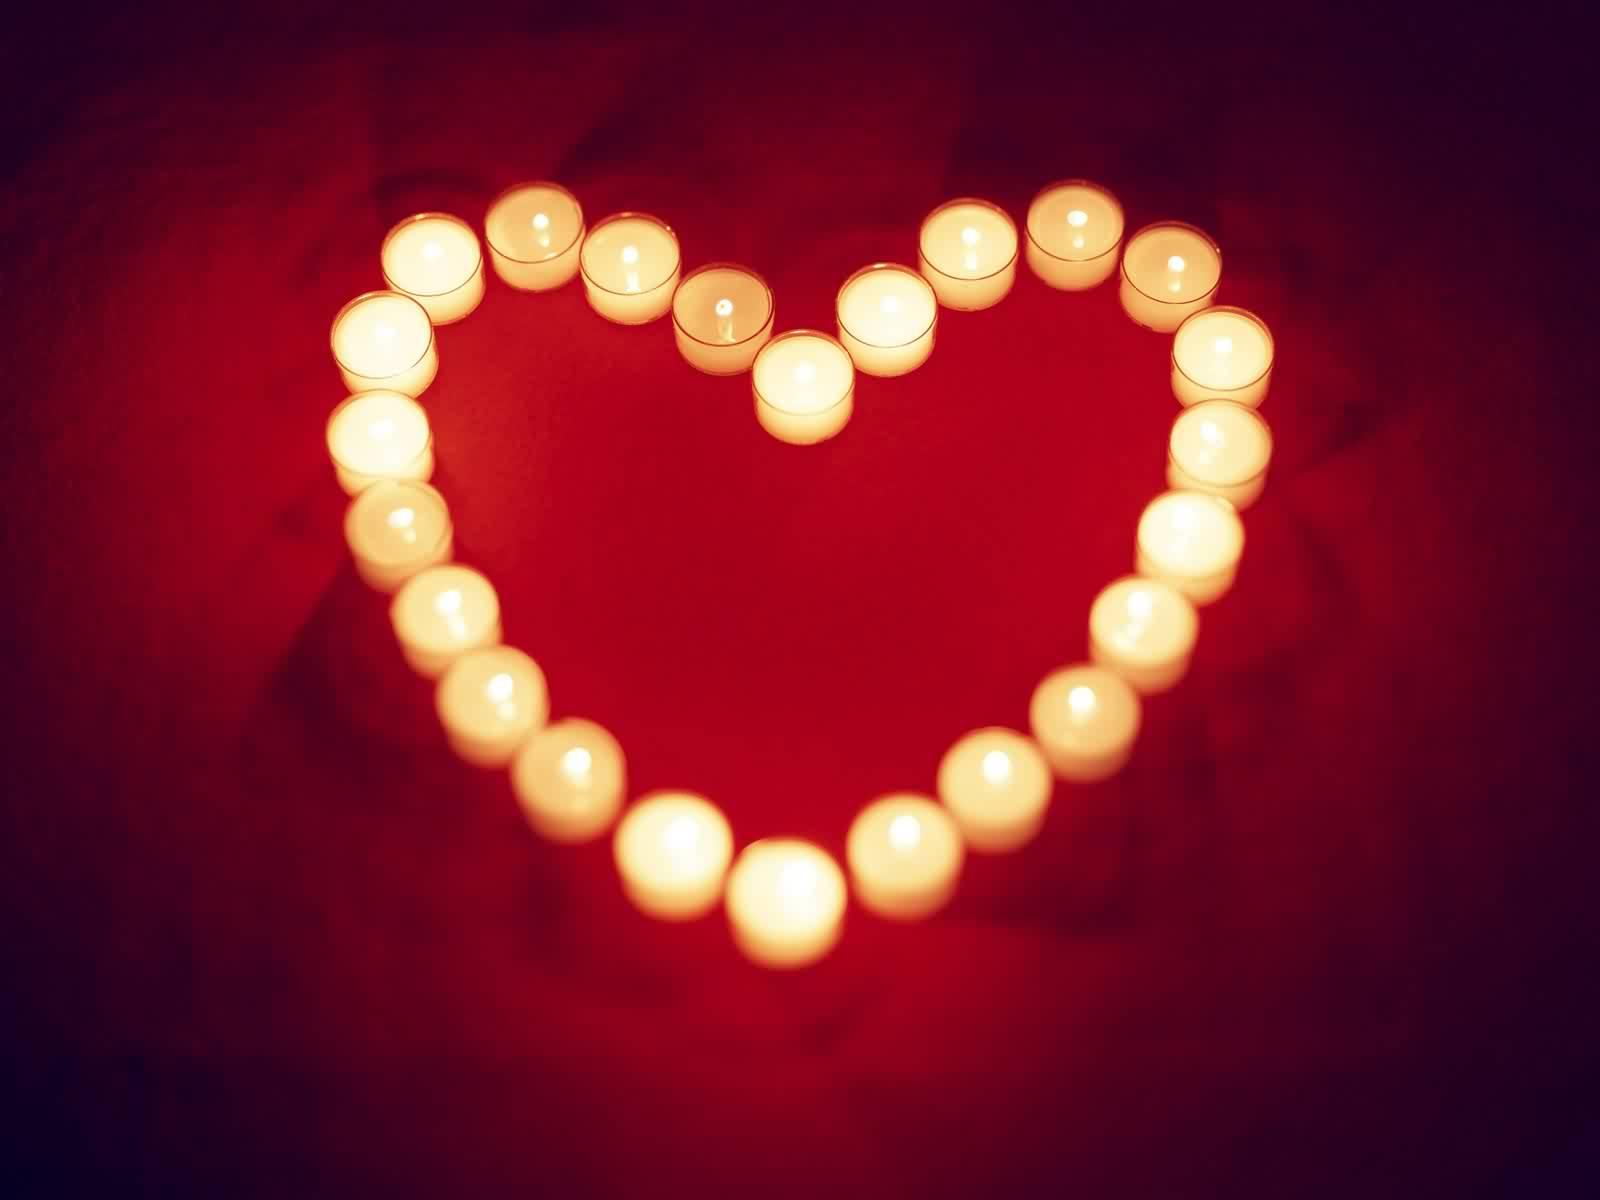 قلب مضيئ بالشموع